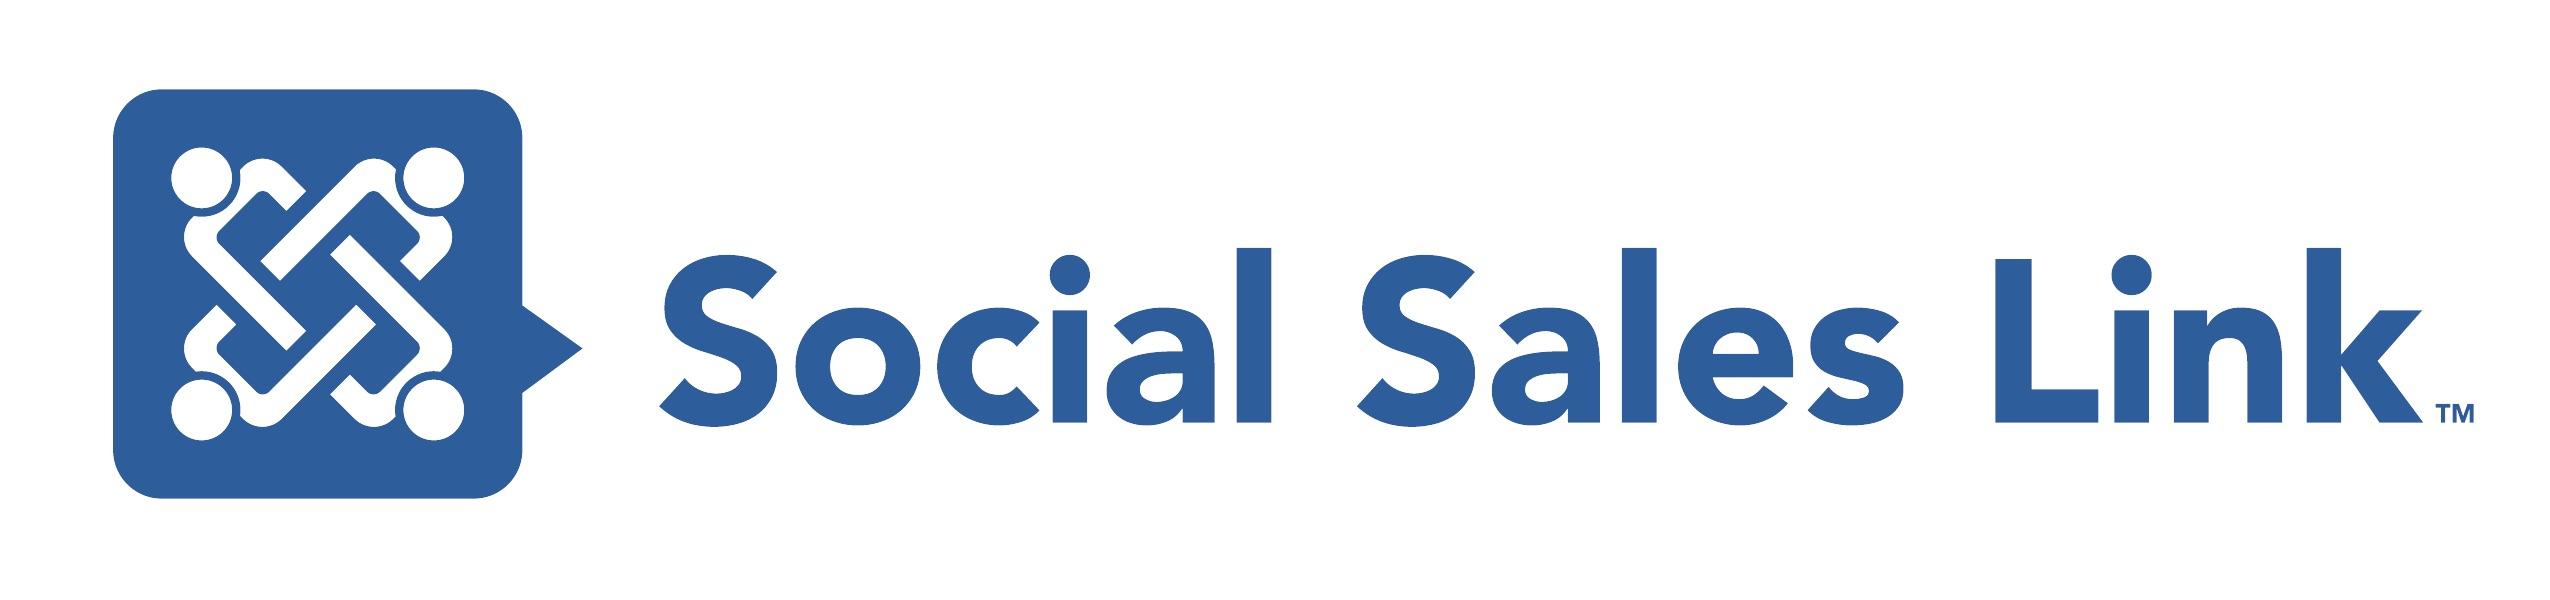 Social Sales Link